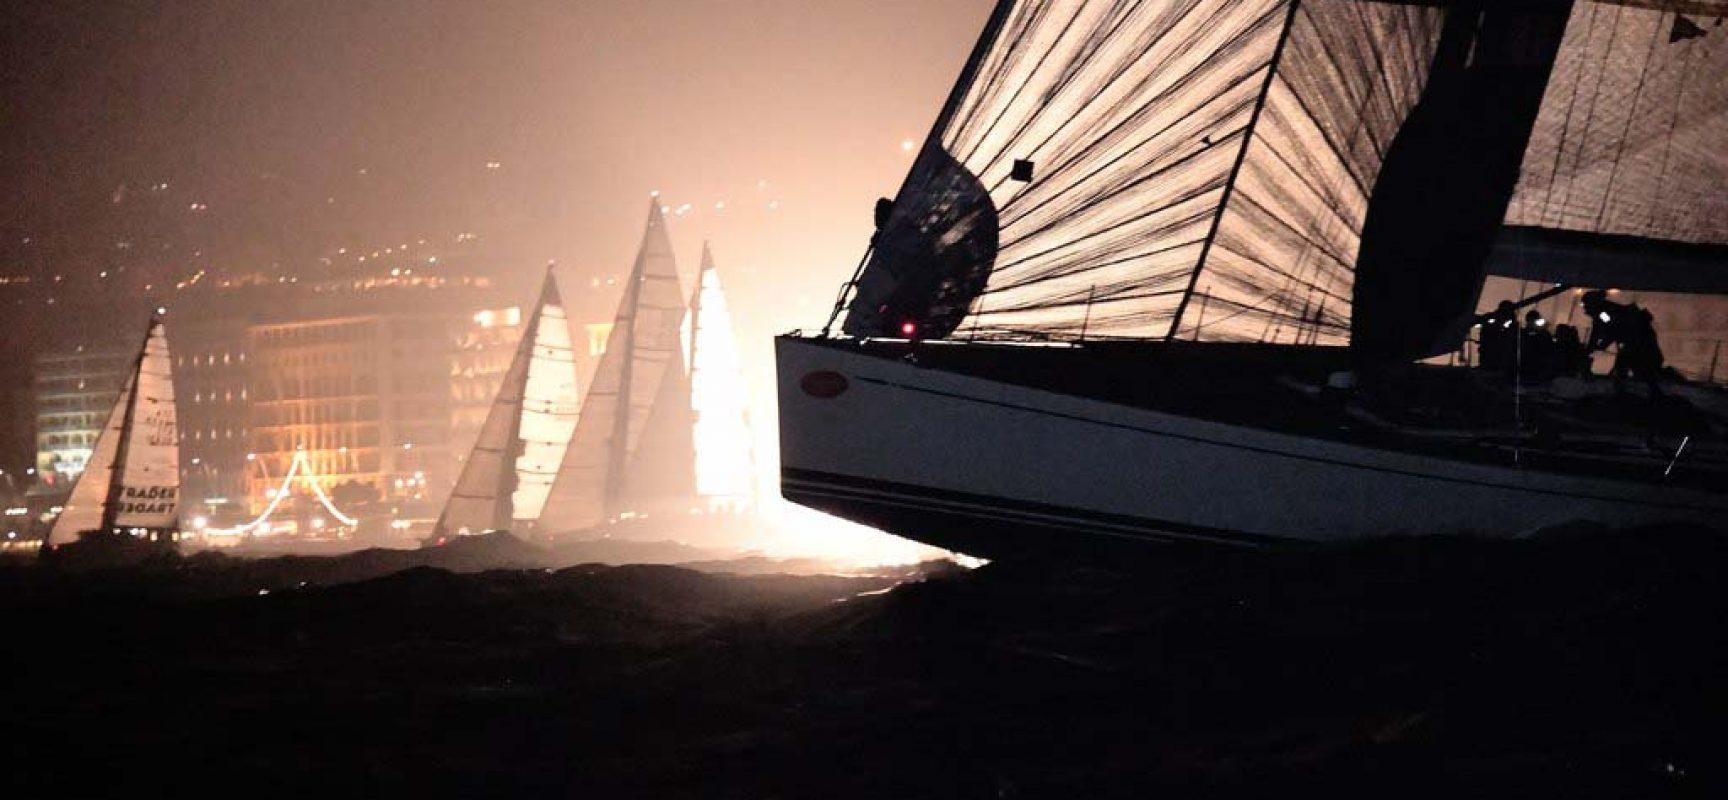 Rolex Capri Sailing Week 700 velisti in gara